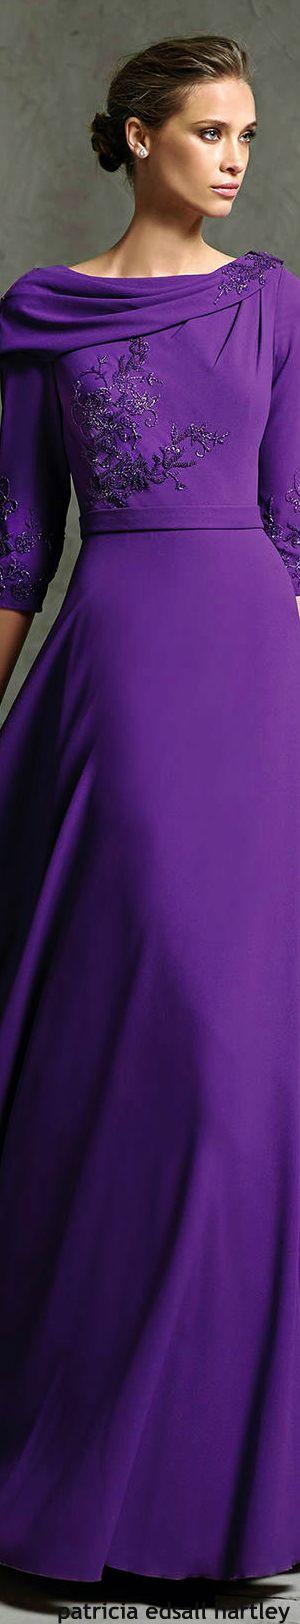 Pin de fadwa ayoub en Fashion dress   Pinterest   Trajes de vestir ...